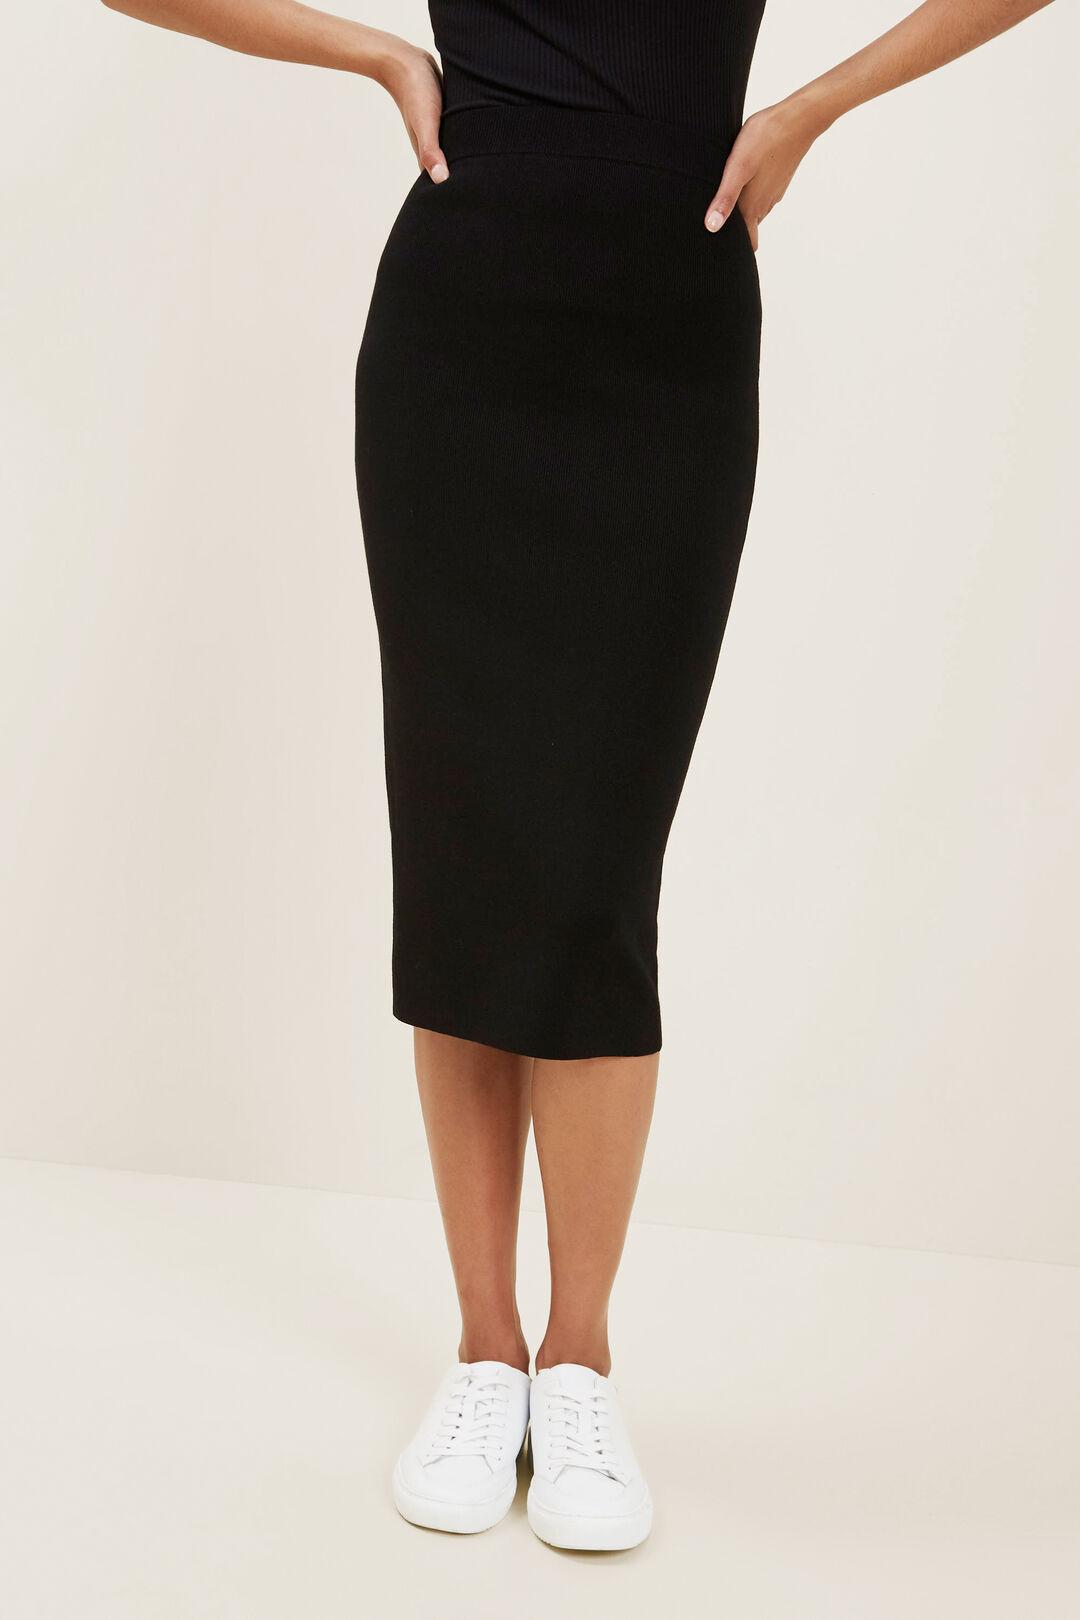 Crepe Knit Pencil Skirt  Black  hi-res